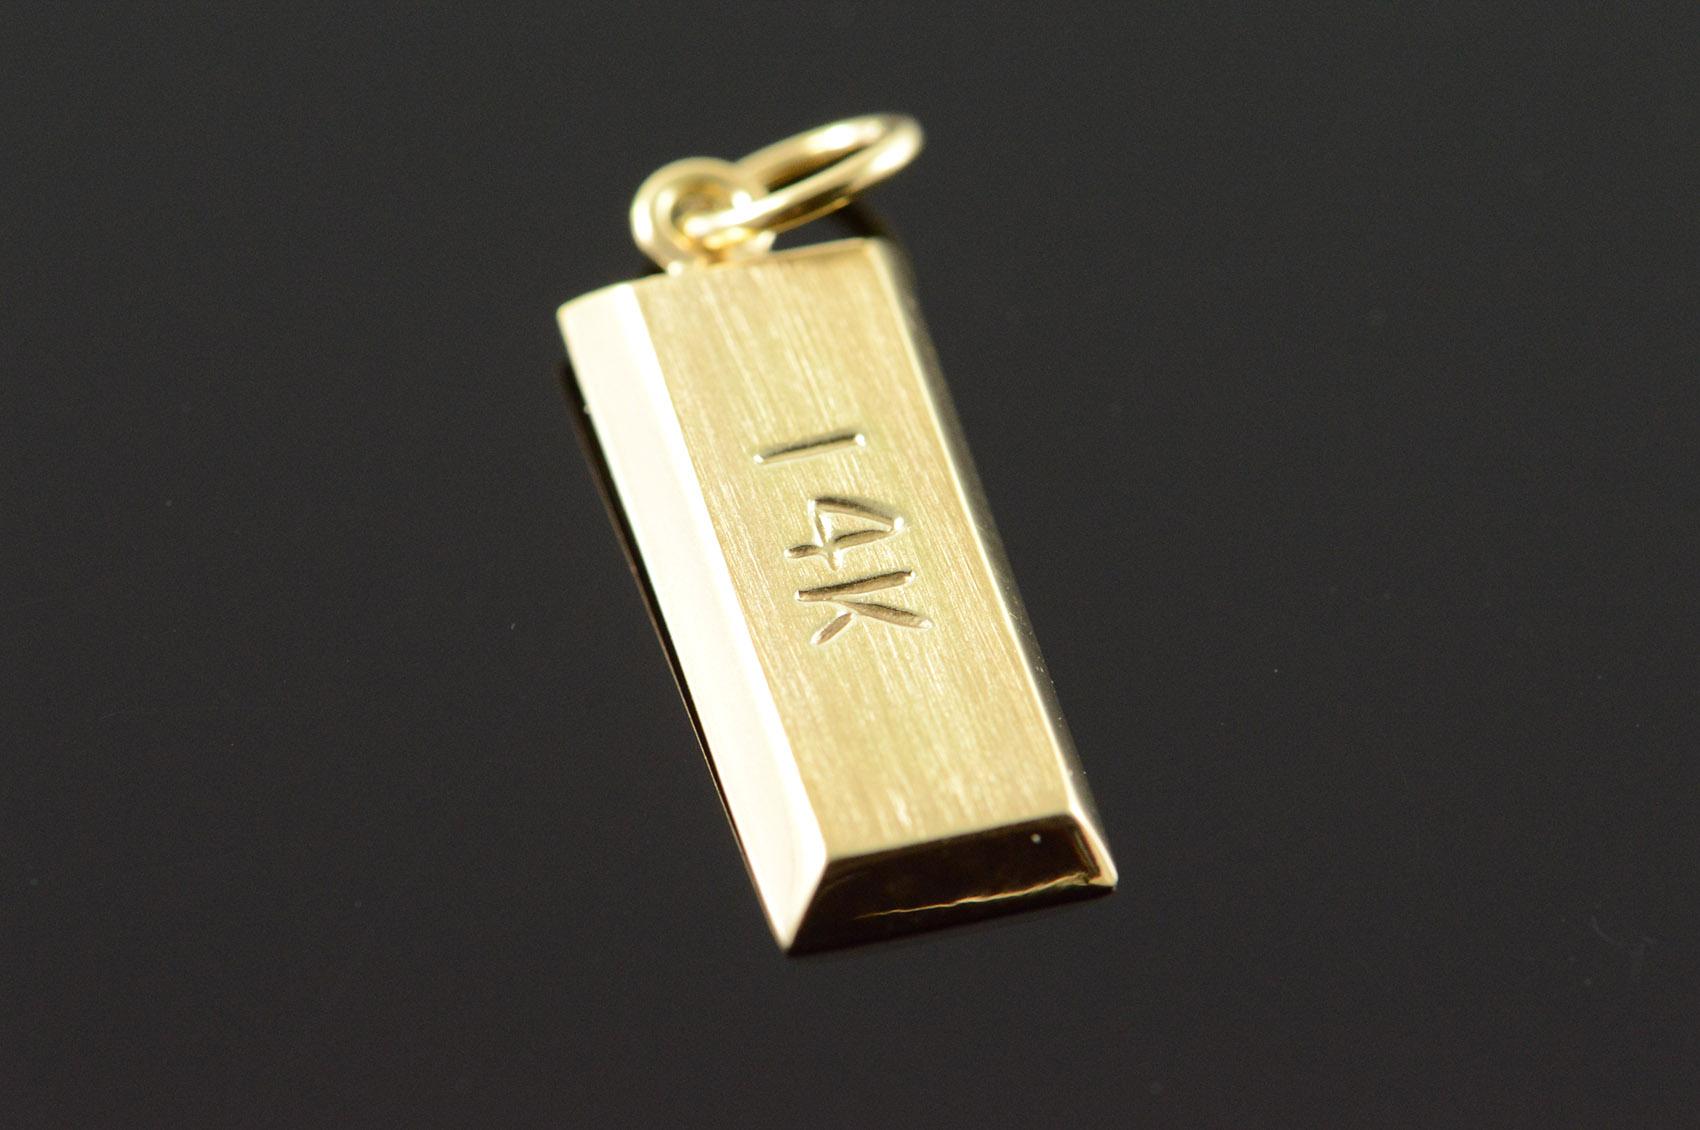 14k Gold Bullion Bar Yellow Gold Charm Pendant Property Room